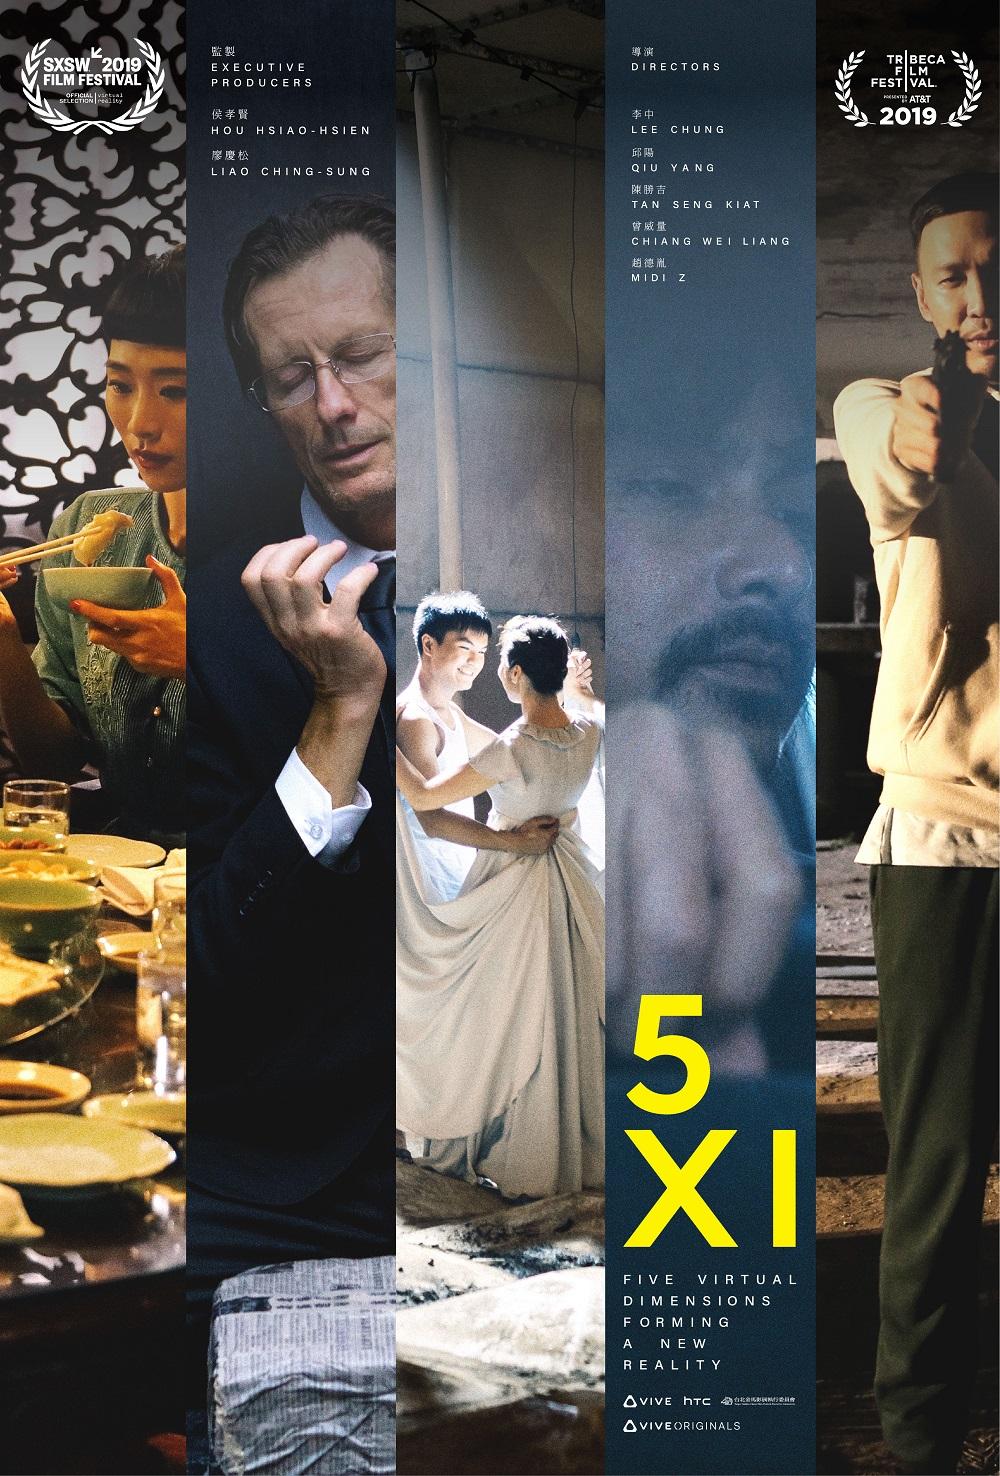 HTC VIVE ORIGINALS VR Film 《5×1》 Debuted in Cannes Film Festival